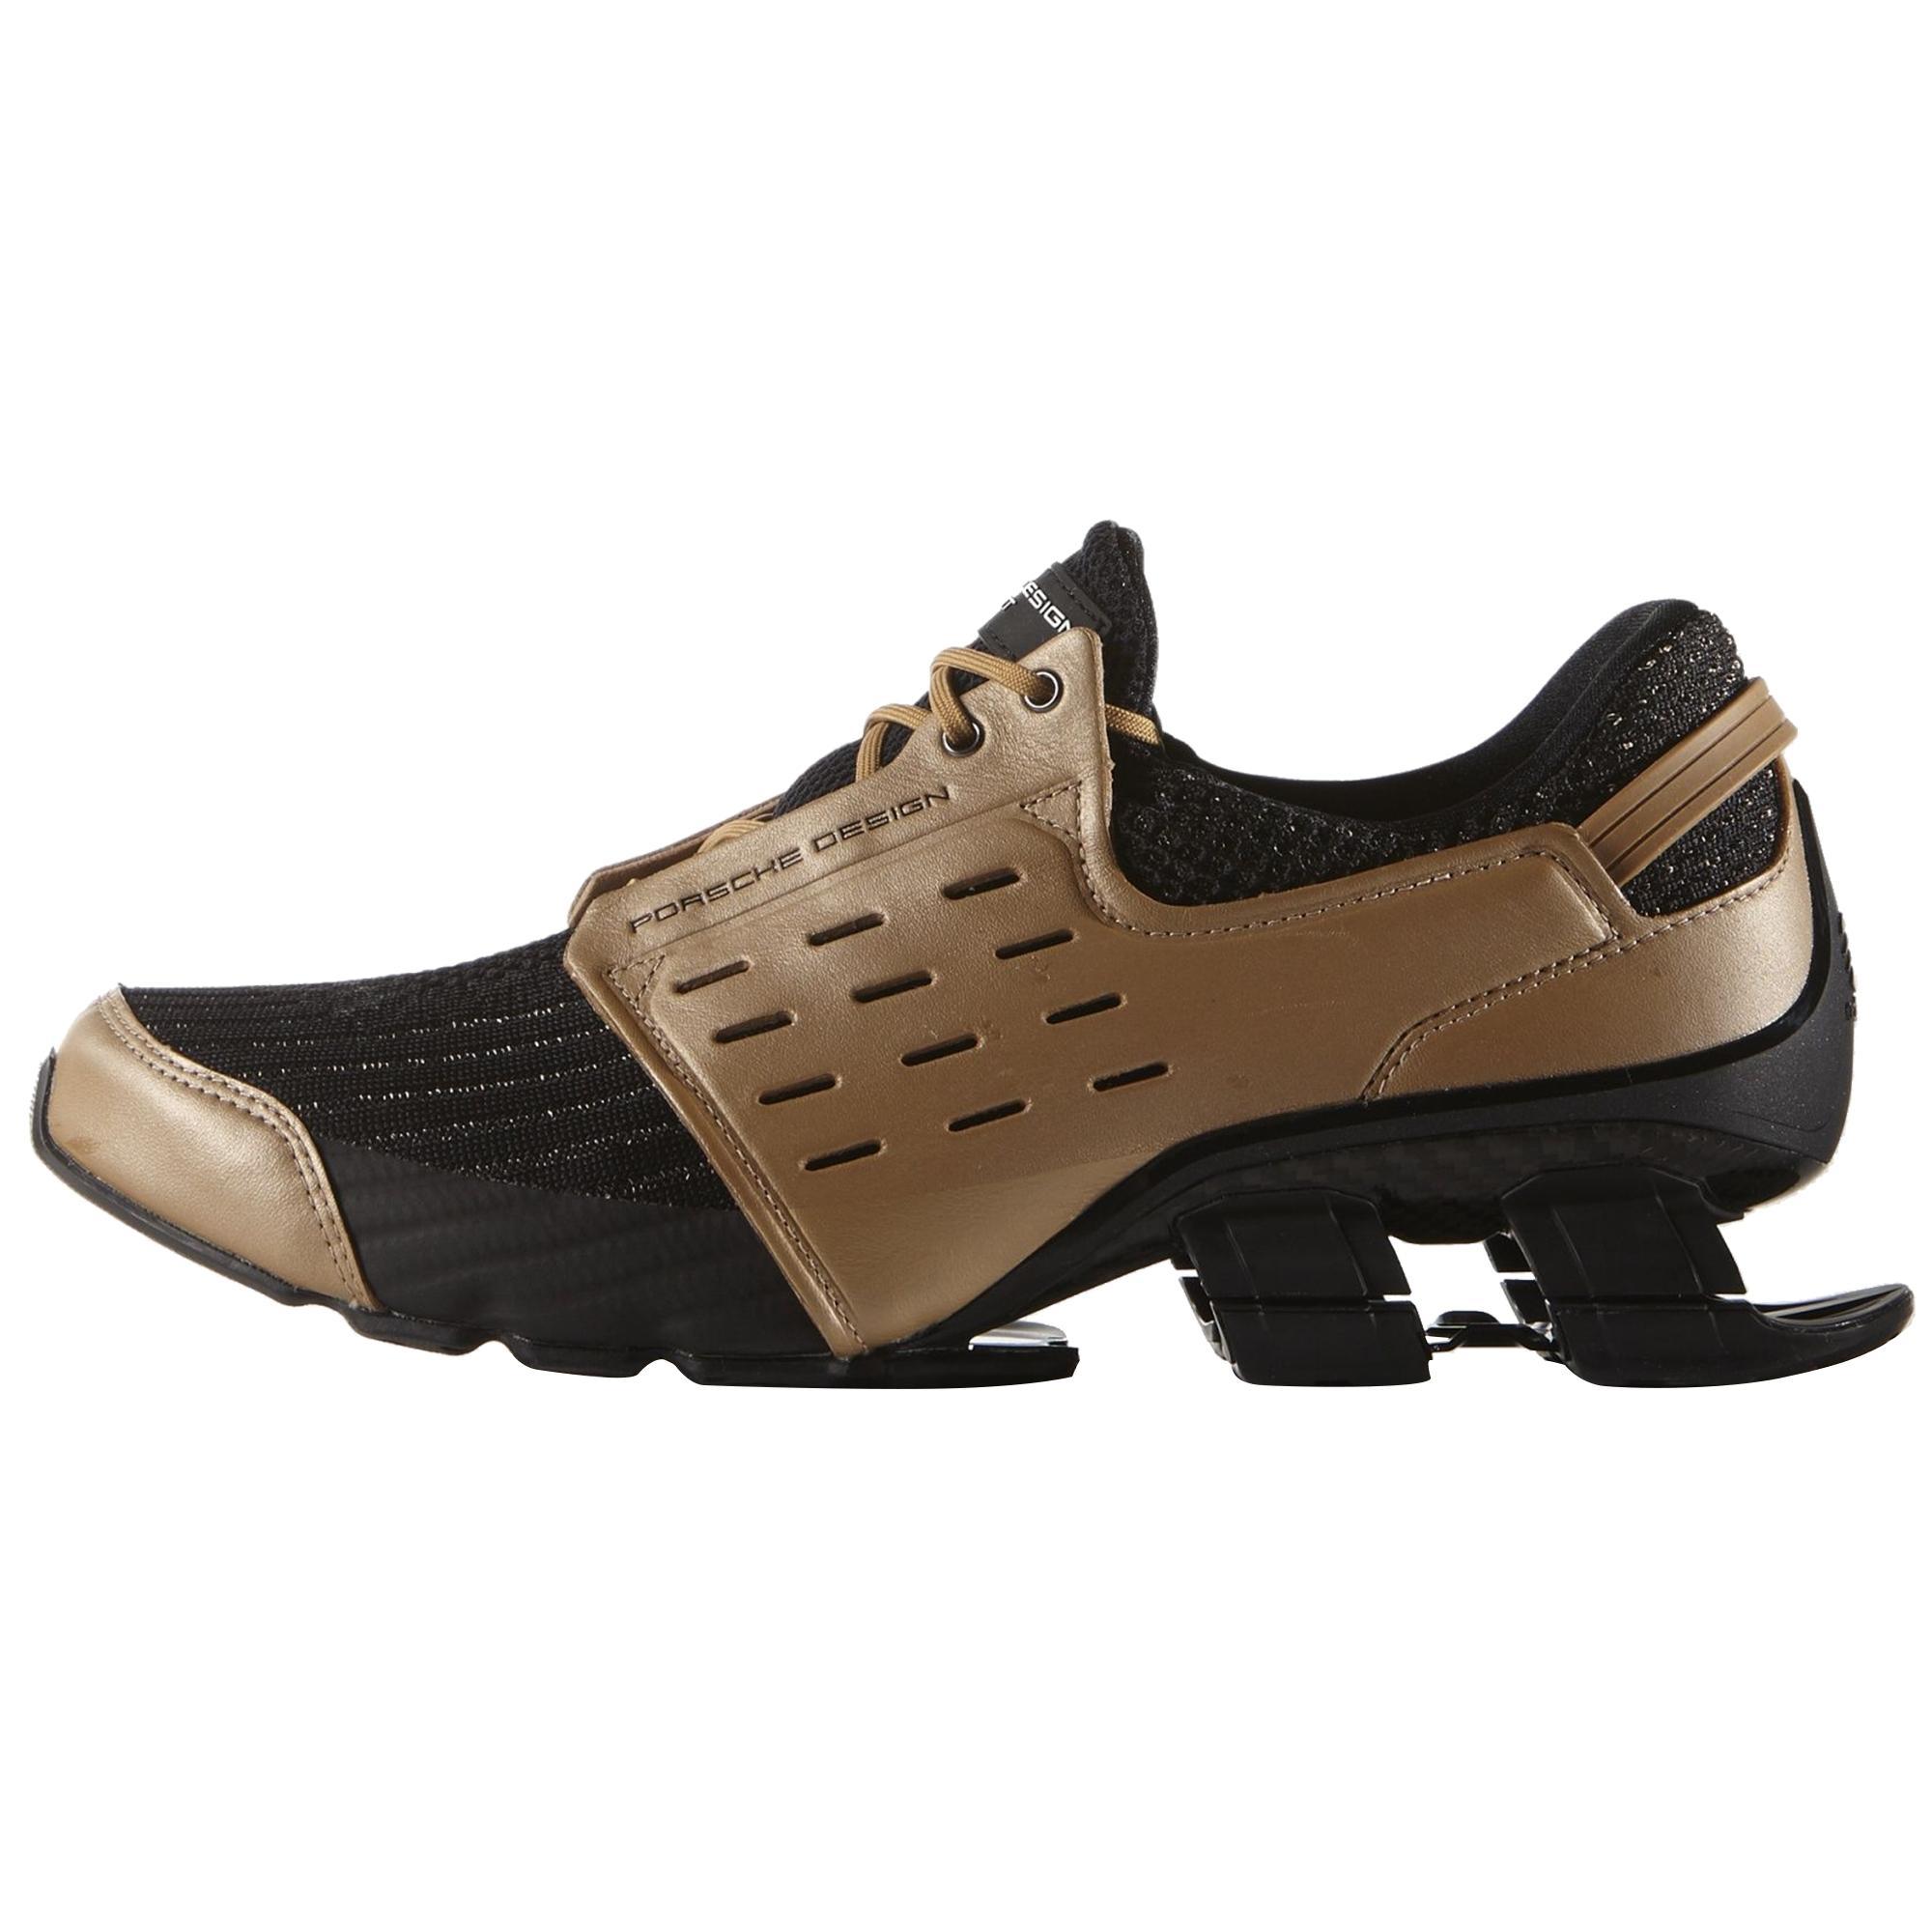 43d10108c9274 ... store adidas porsche design bounce s4 style erkek spor ayakkab 63935  4c849